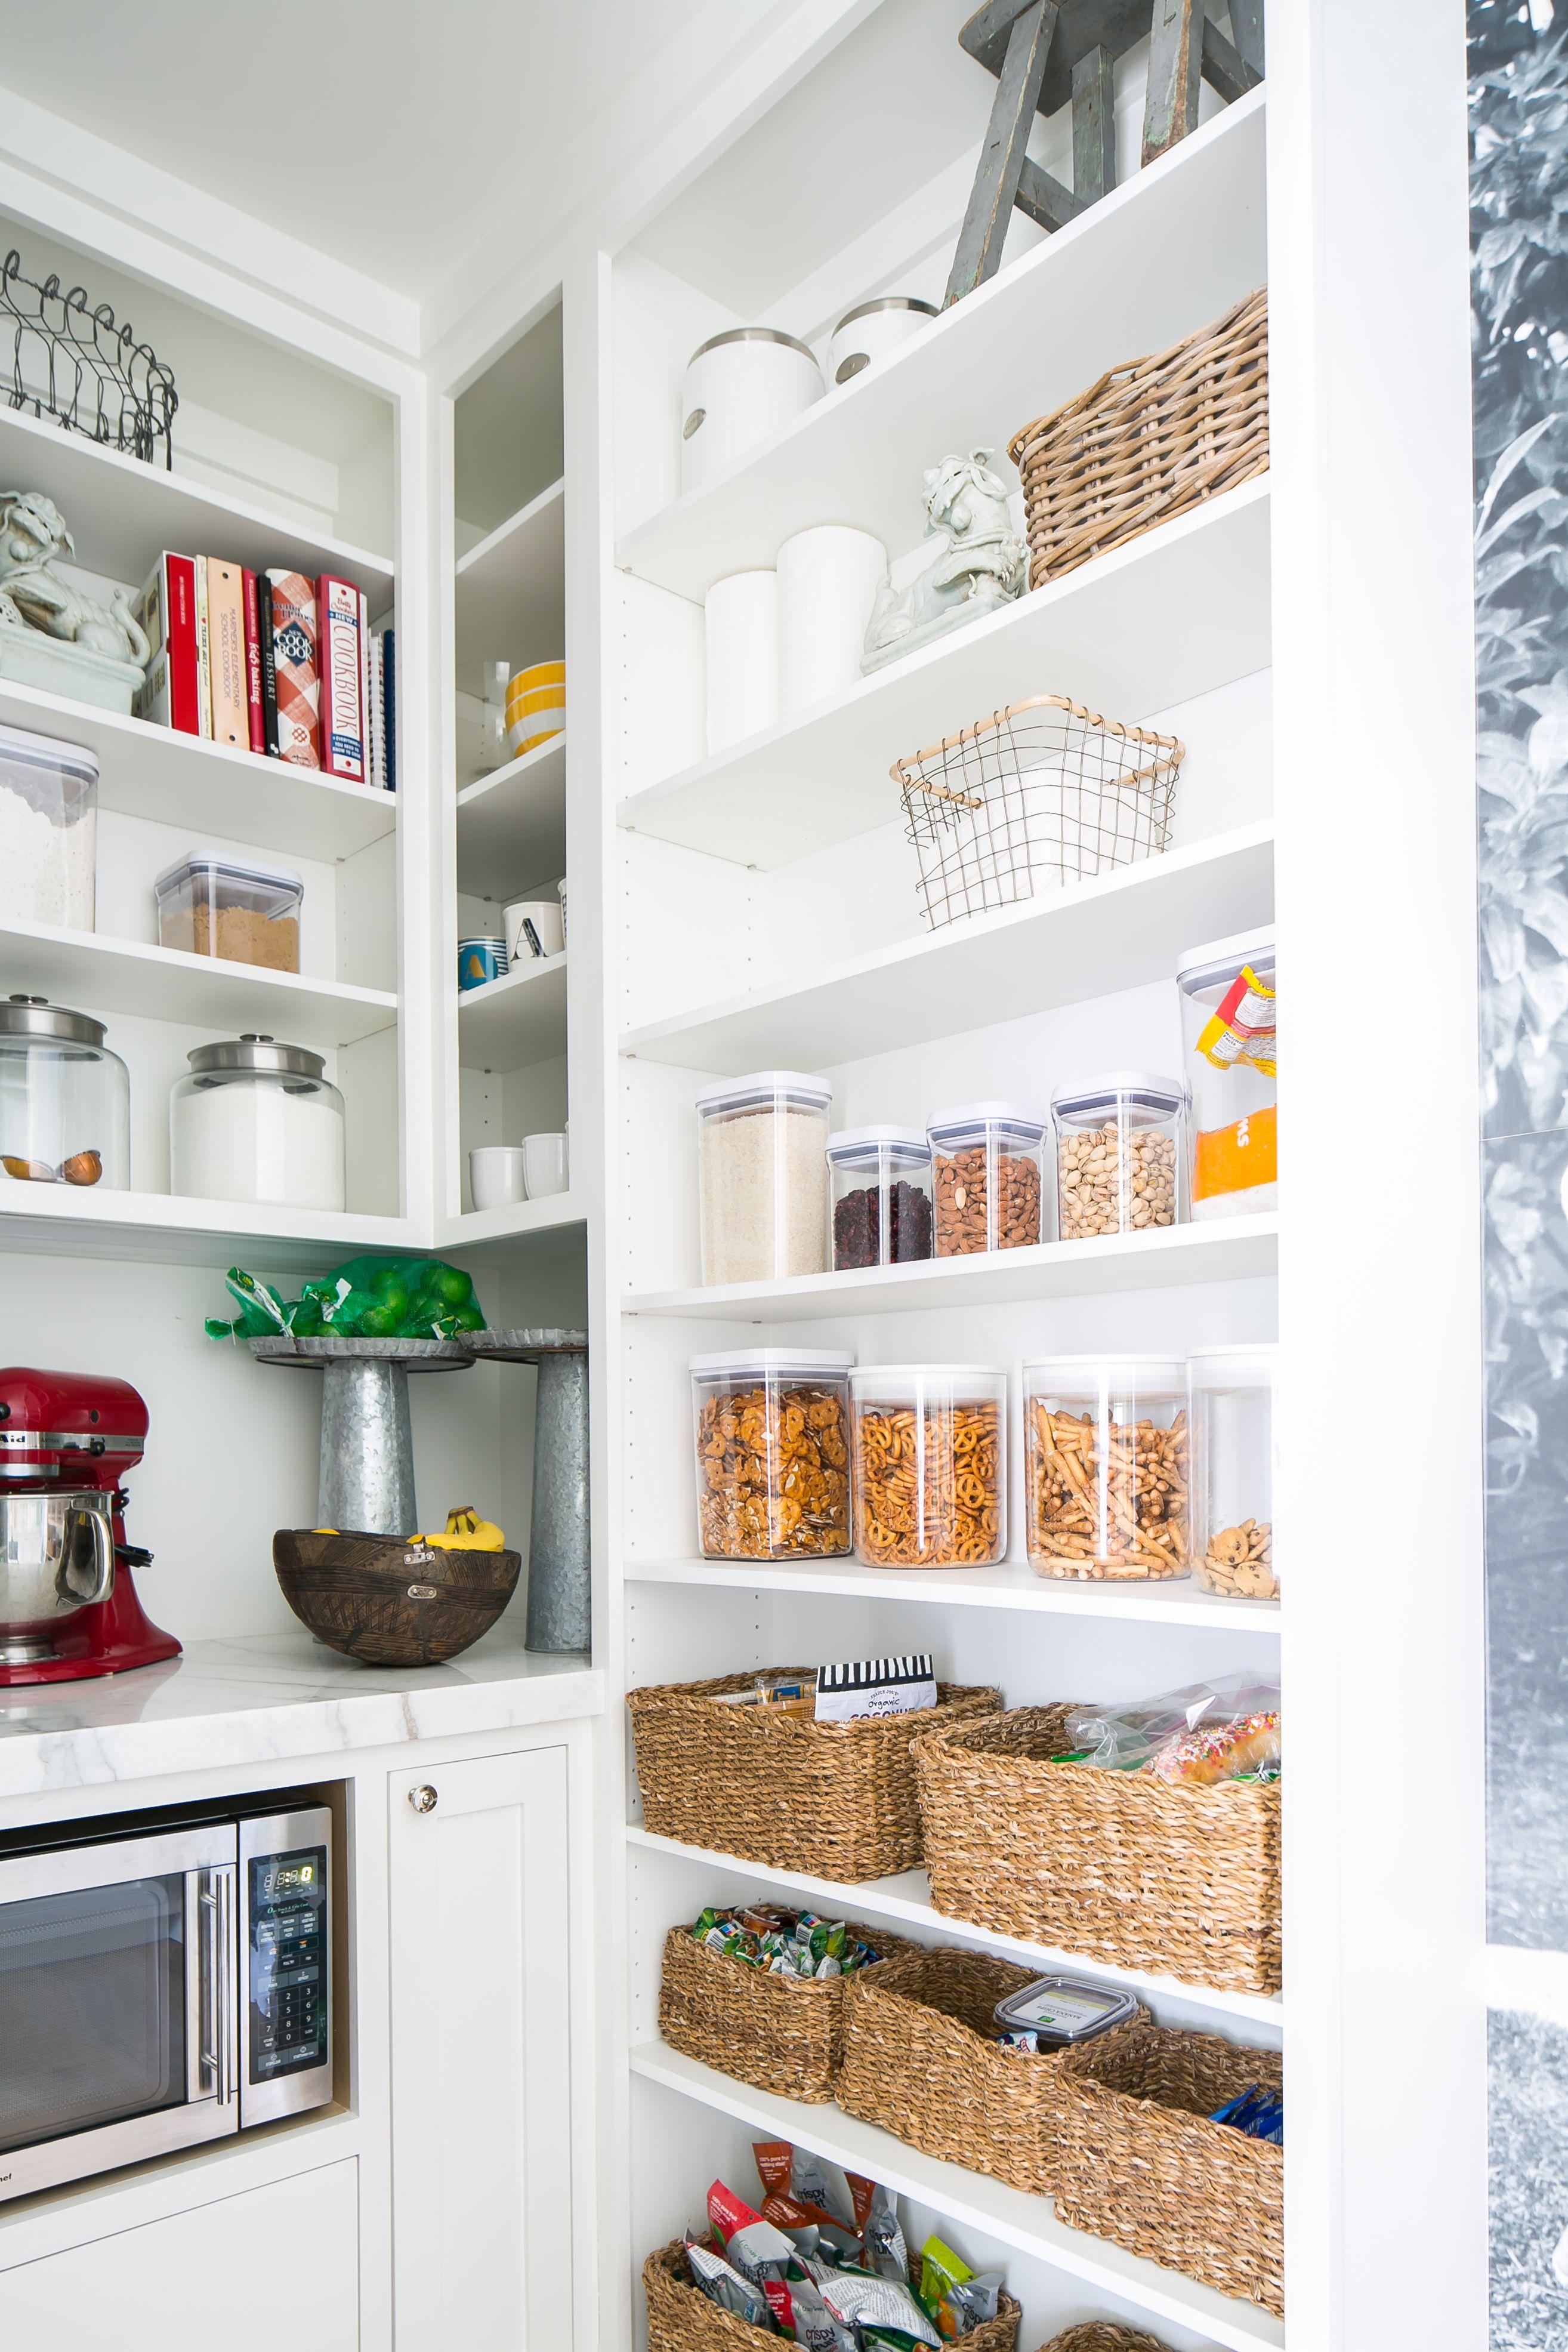 13 Kitchen Storage Ideas That Make It Impossible To Be Disorganized